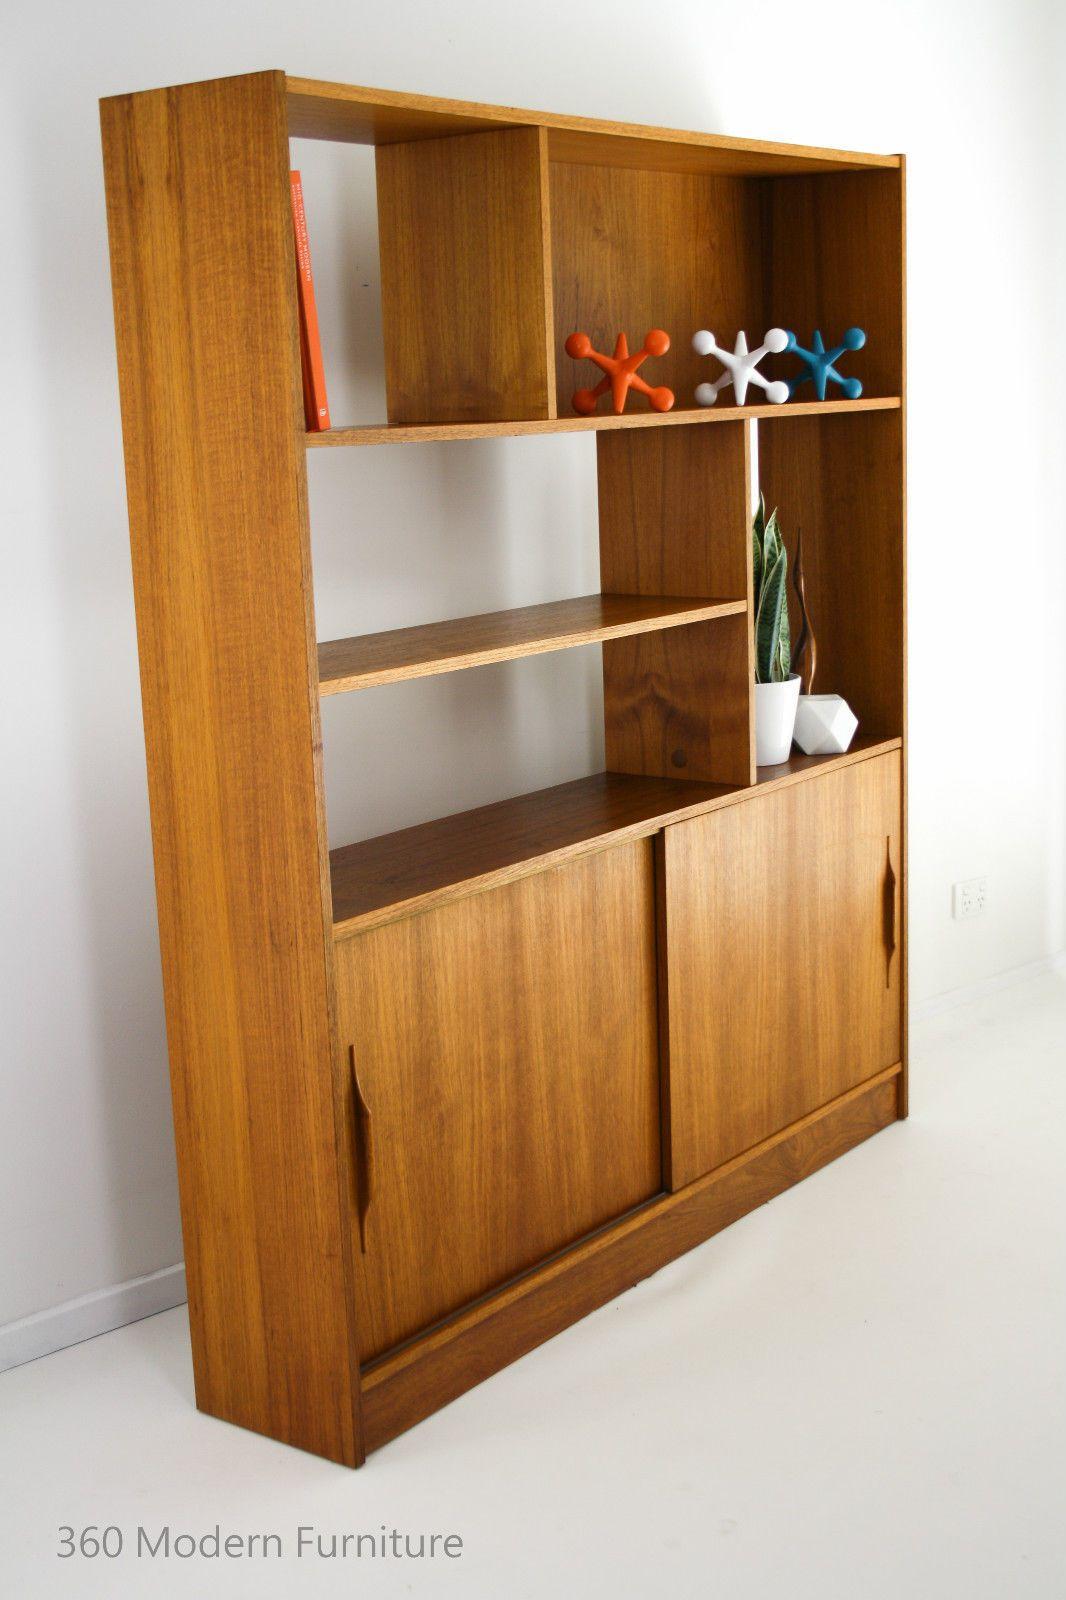 Modern Furniture Wall Units mid century room divider wall unit bookcase teak shelves retro